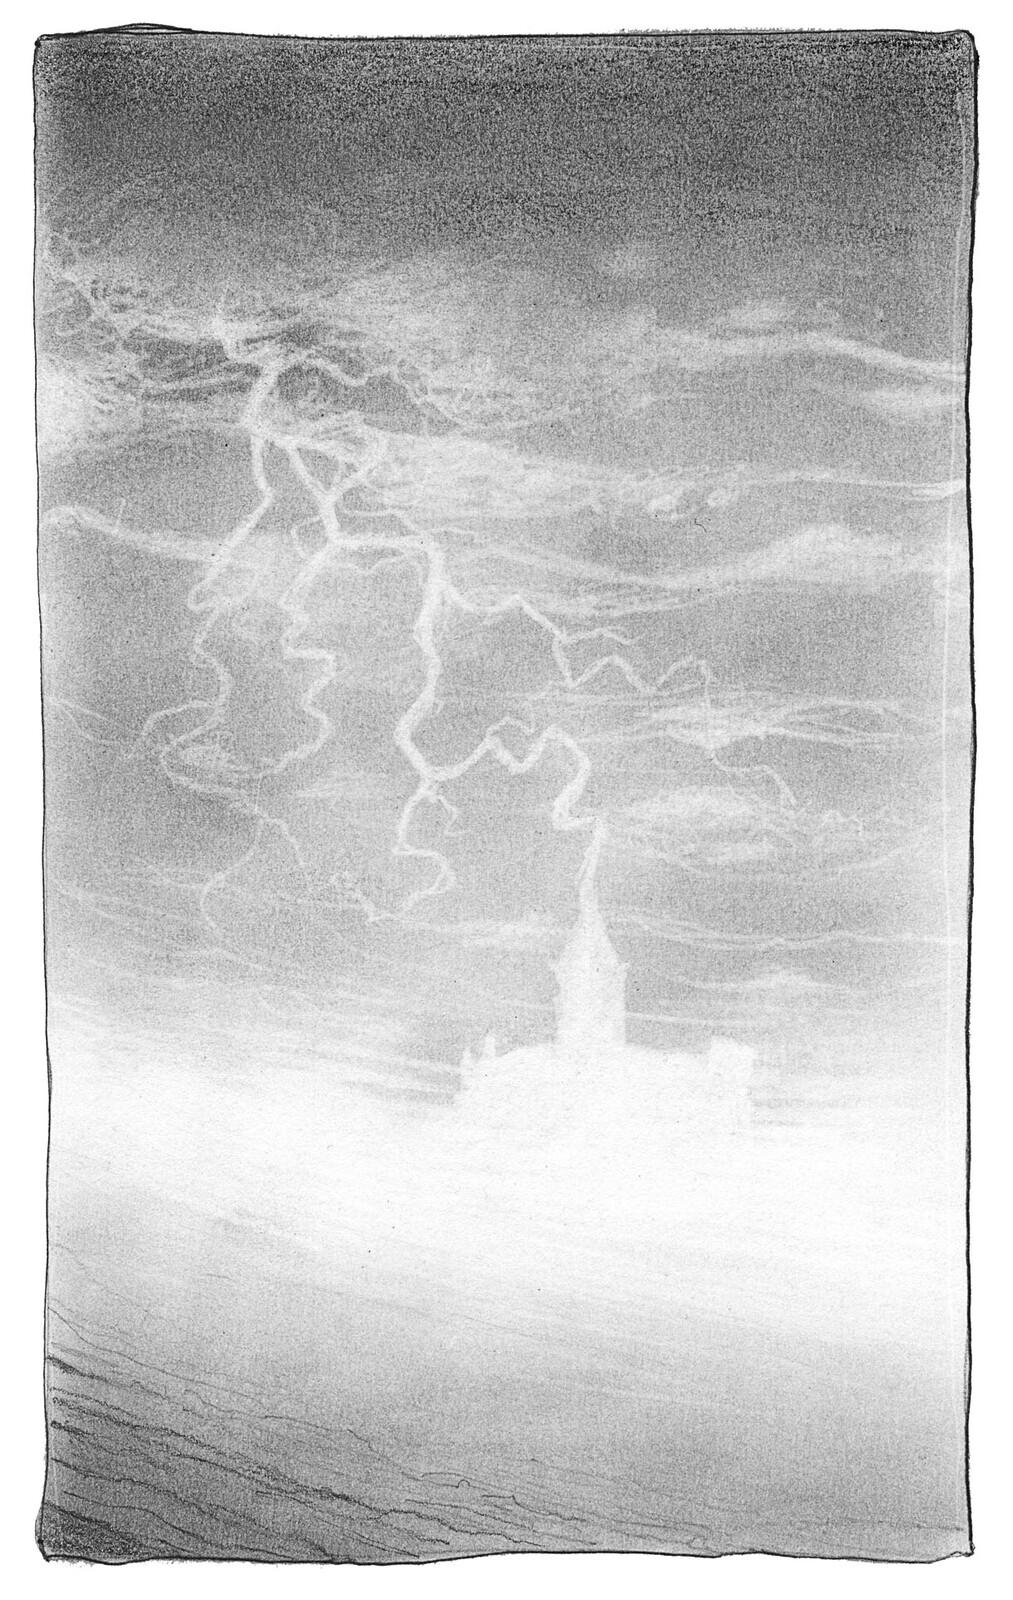 Inktober 2020 day 17 : storm